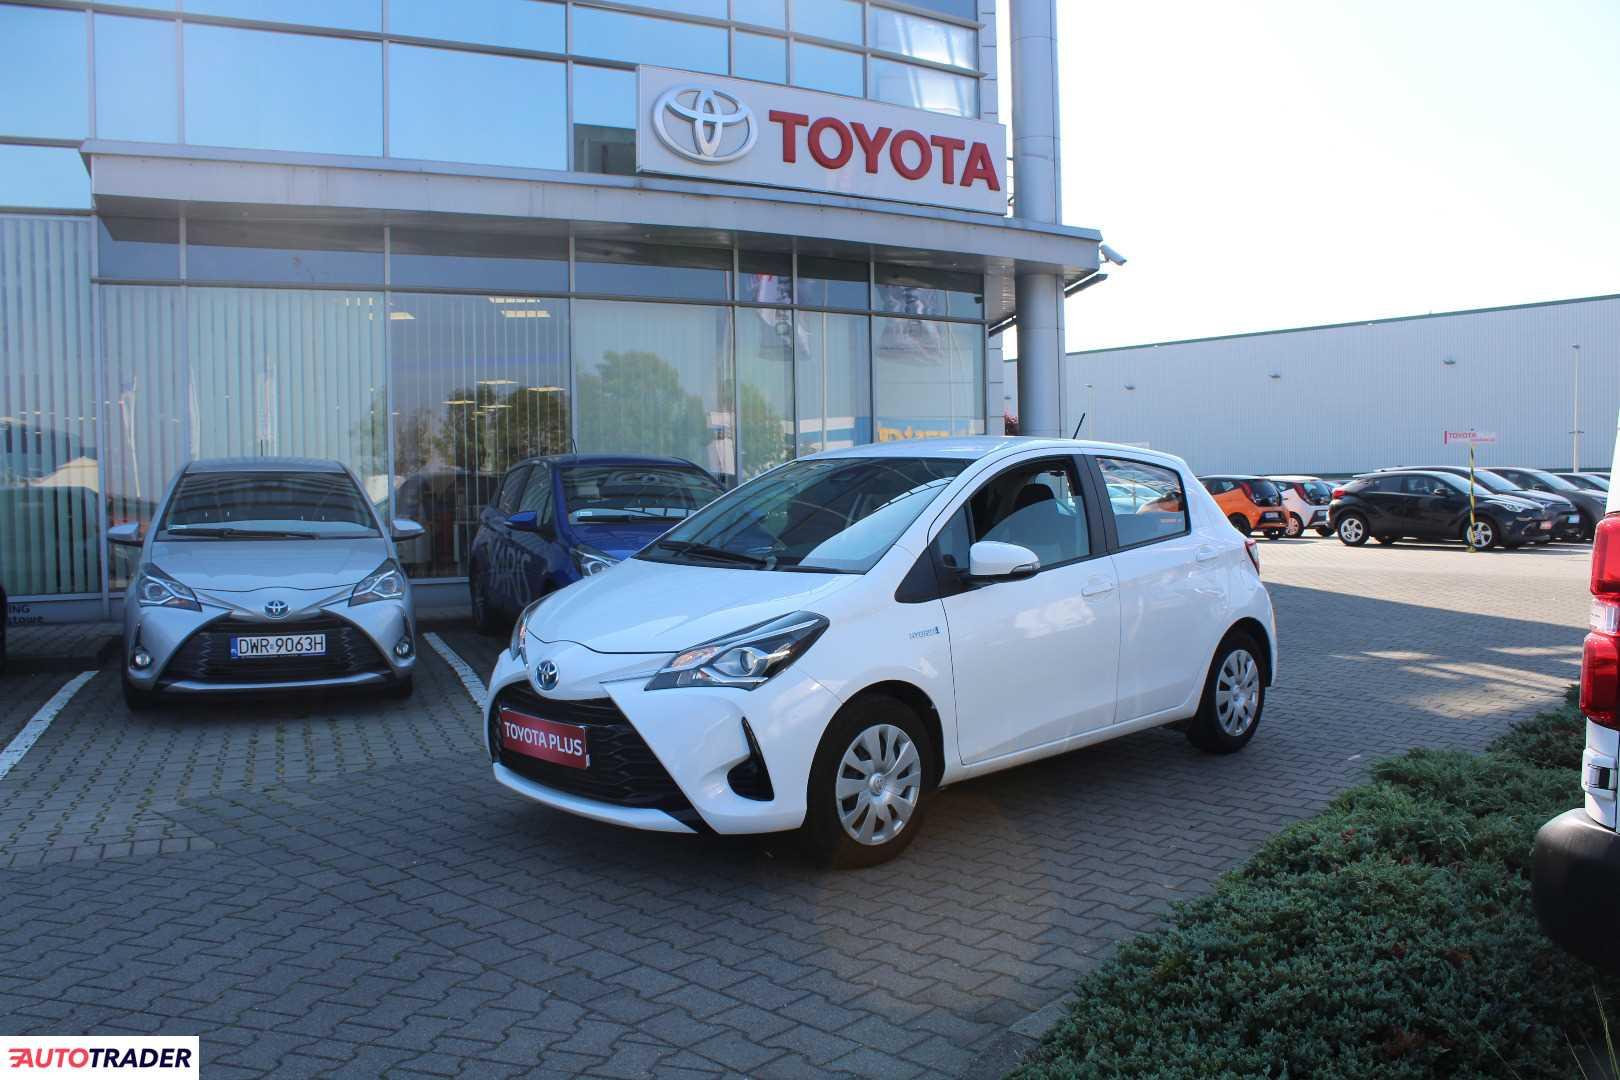 Toyota Yaris 2017 1.5 100 KM